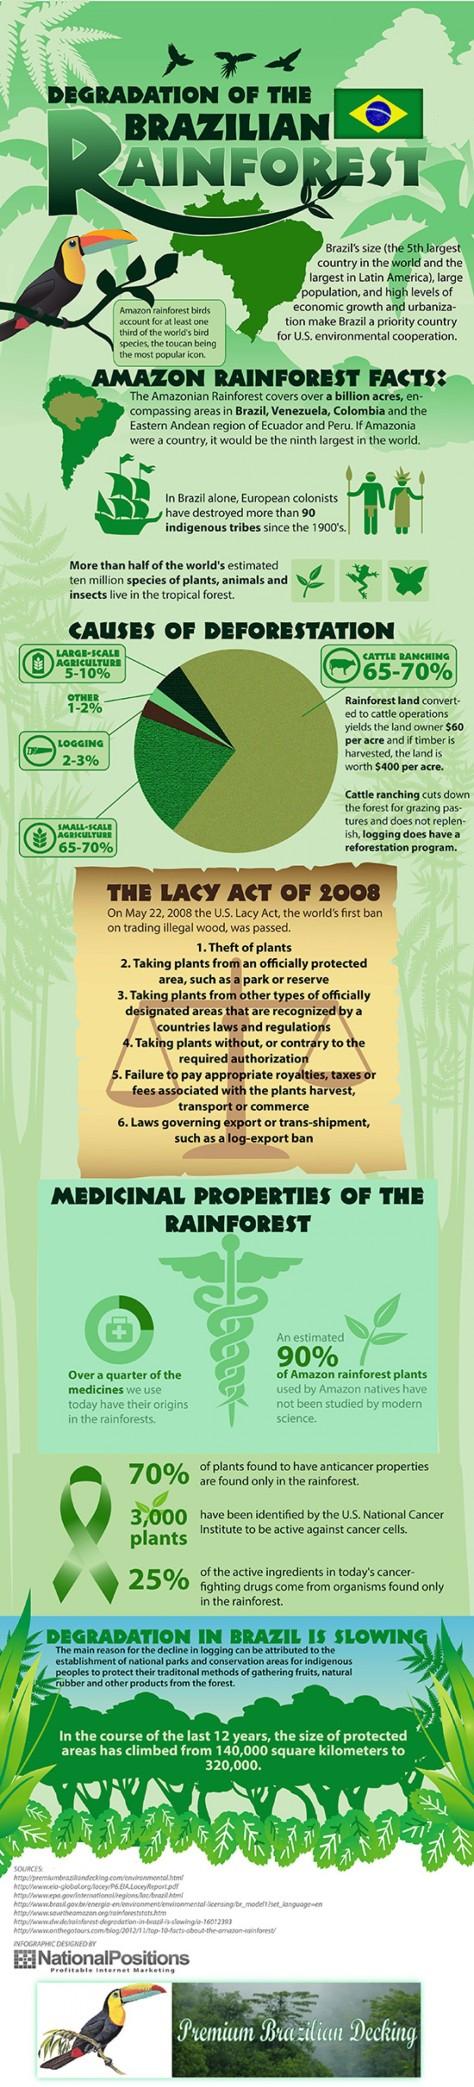 deforestation-of-the-amazon-rainforest_519329bff19e1_w1500